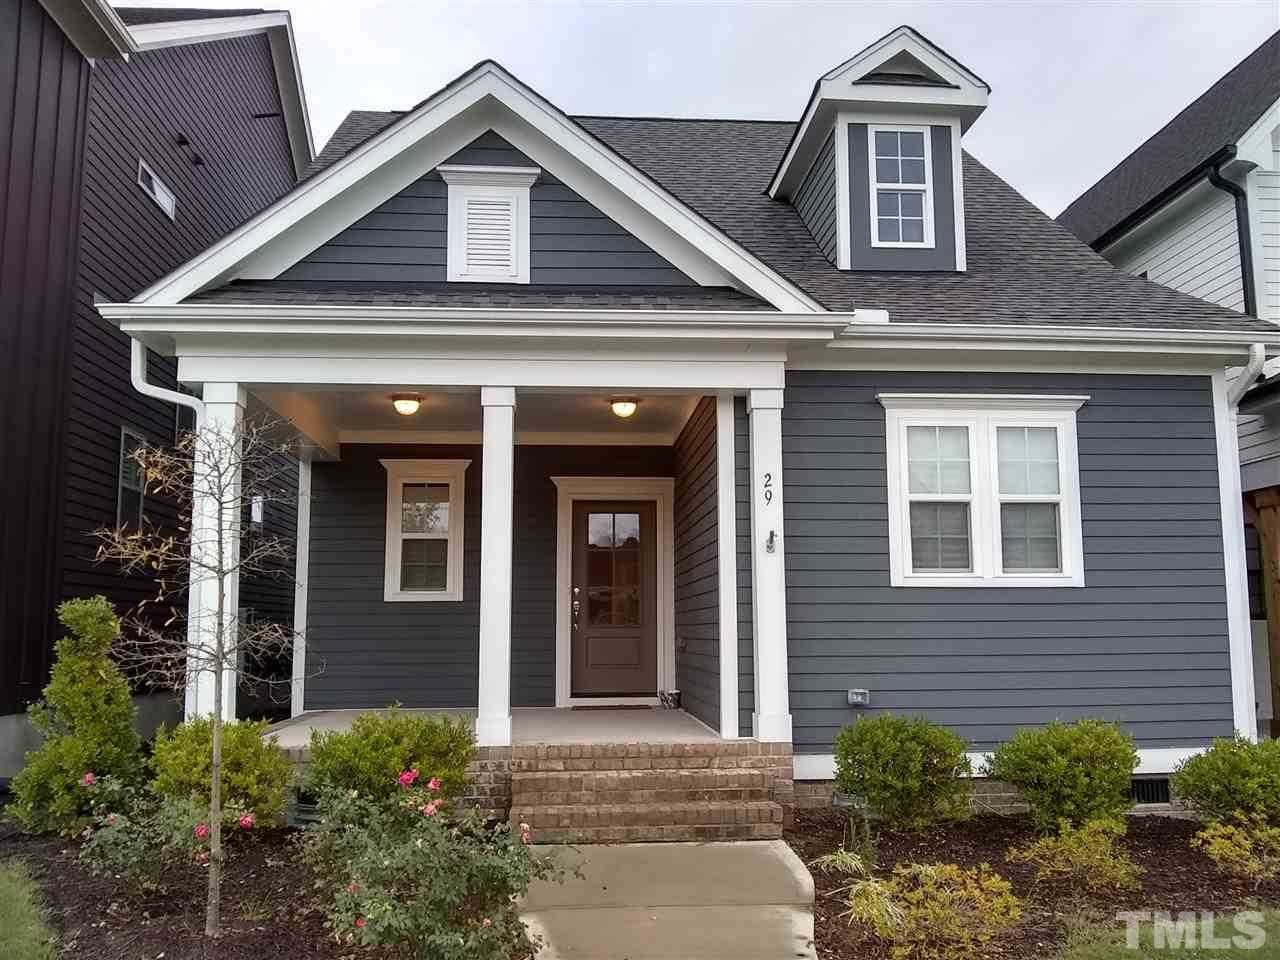 $315,000 - 3Br/3Ba -  for Sale in Briar Chapel, Chapel Hill